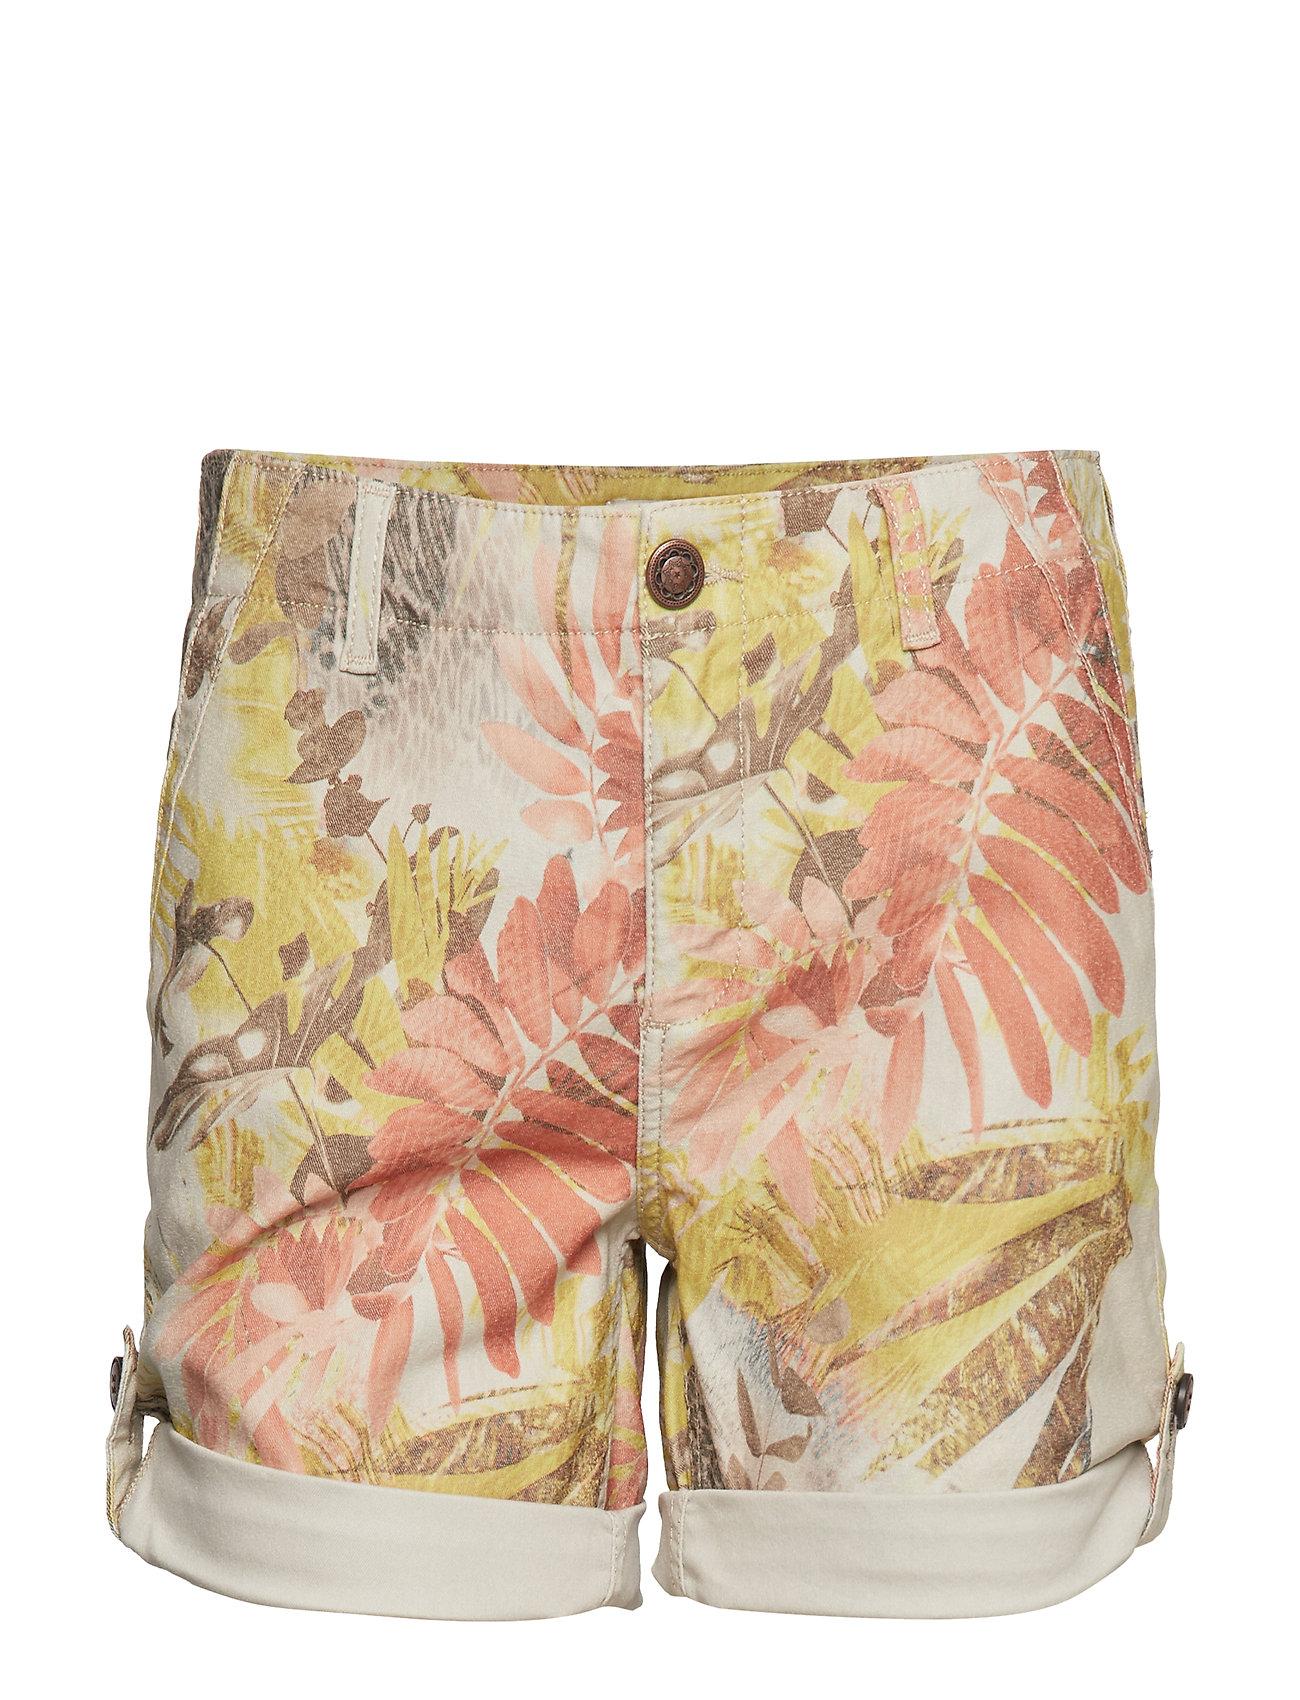 MOS MOSH Freya Cape Shorts - CASHEW FLOWER